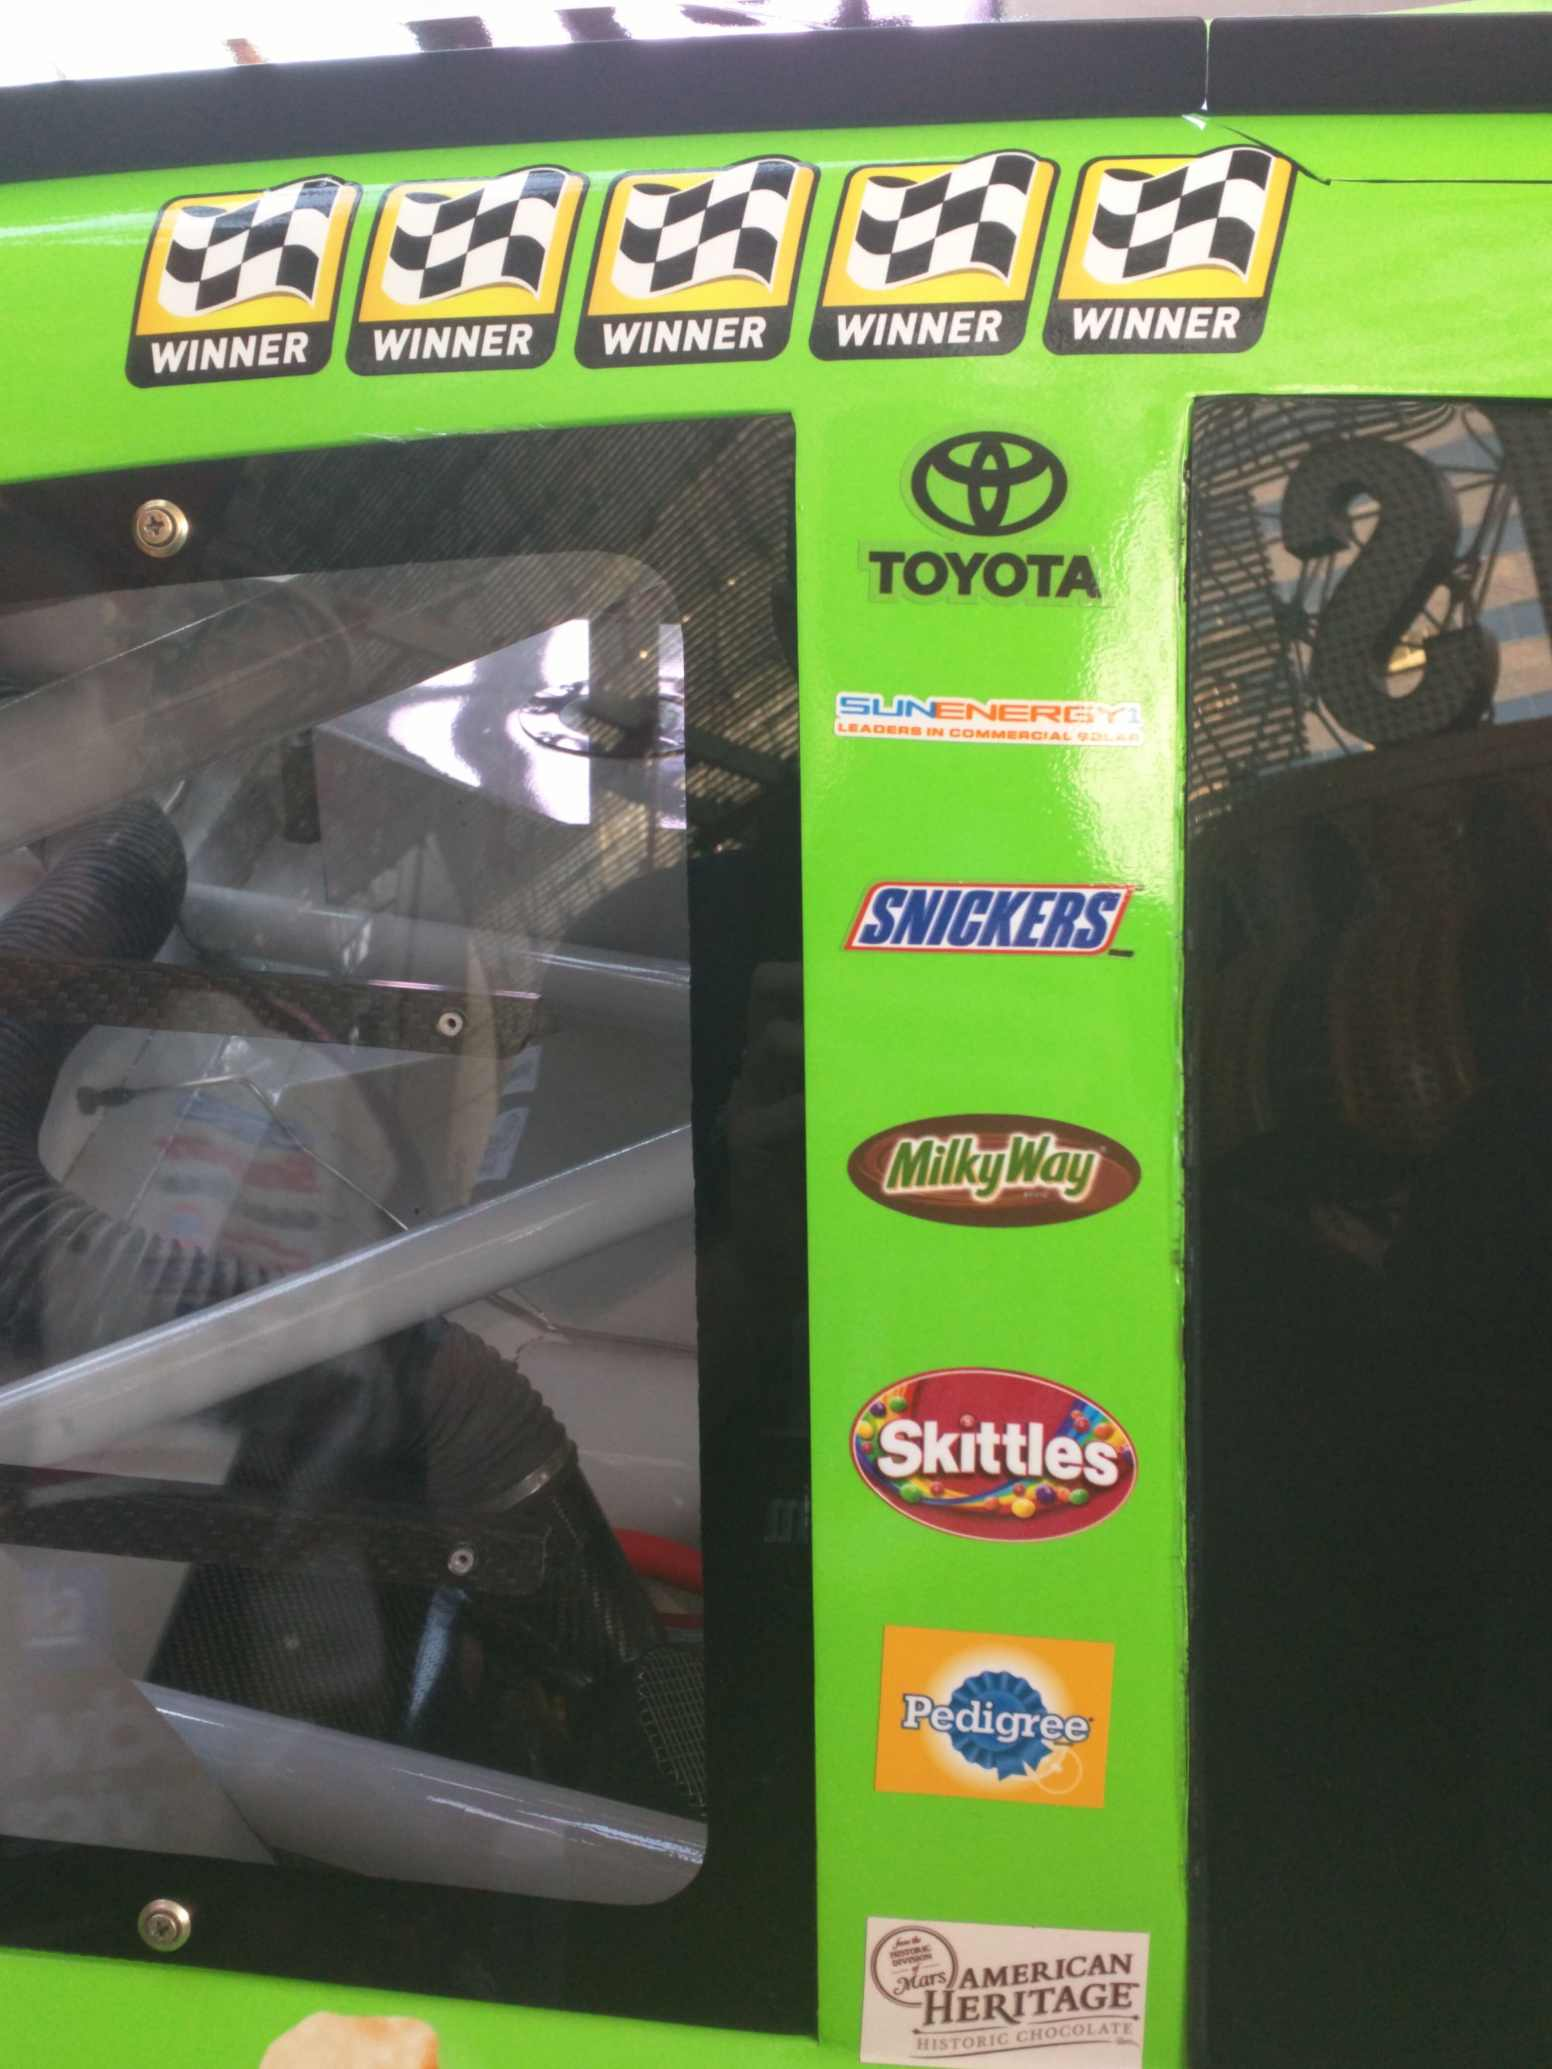 Kyle Busch 2015 Winners Stickers